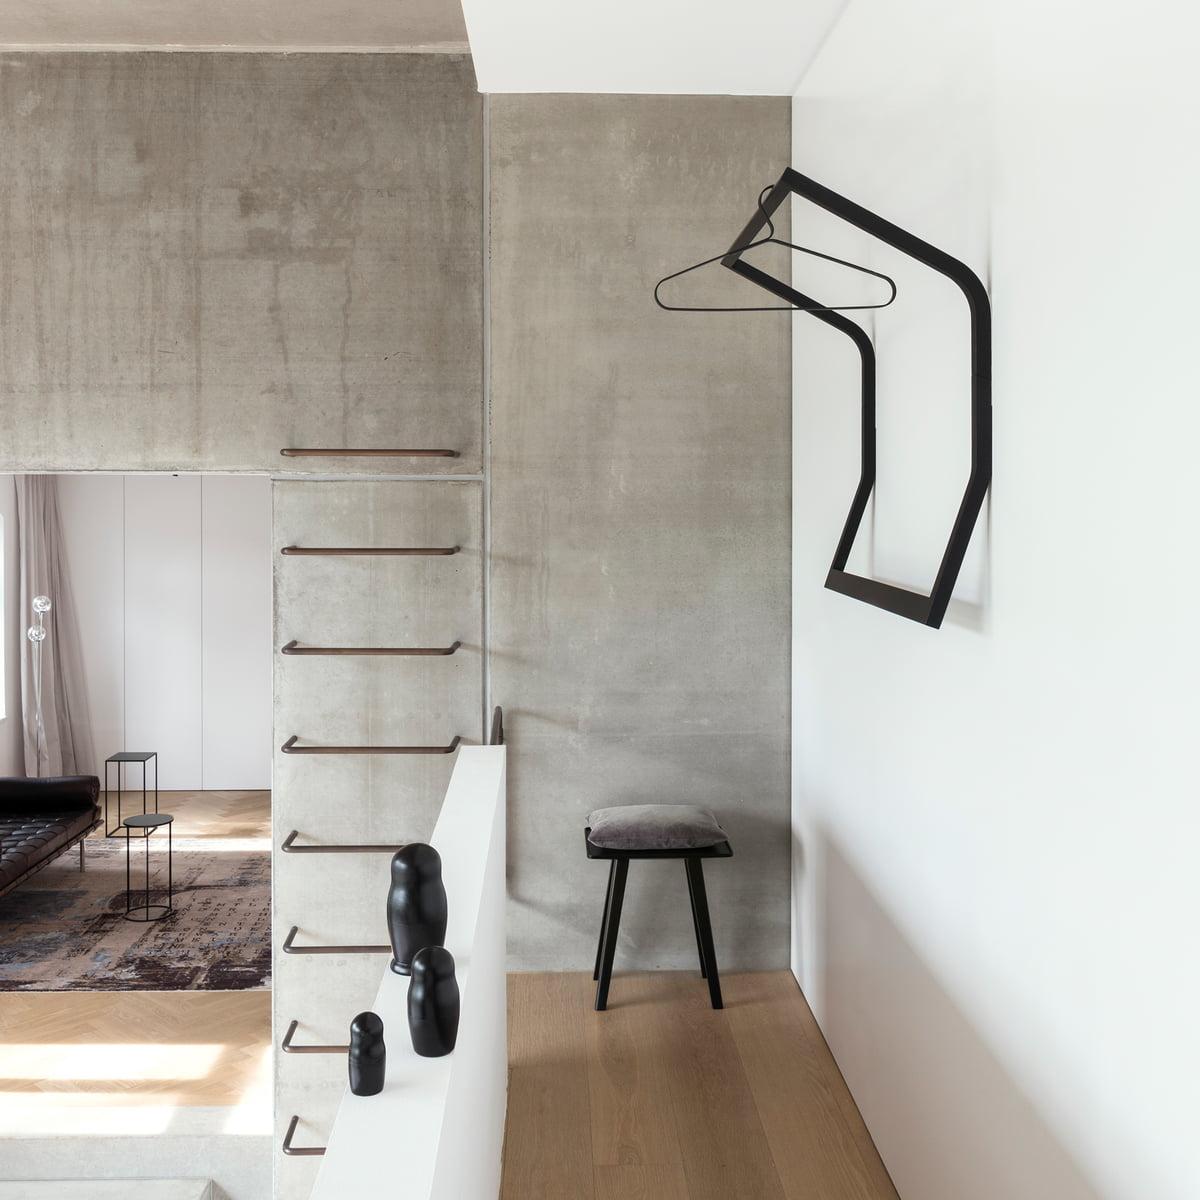 sch nbuch sled wandgarderobe. Black Bedroom Furniture Sets. Home Design Ideas